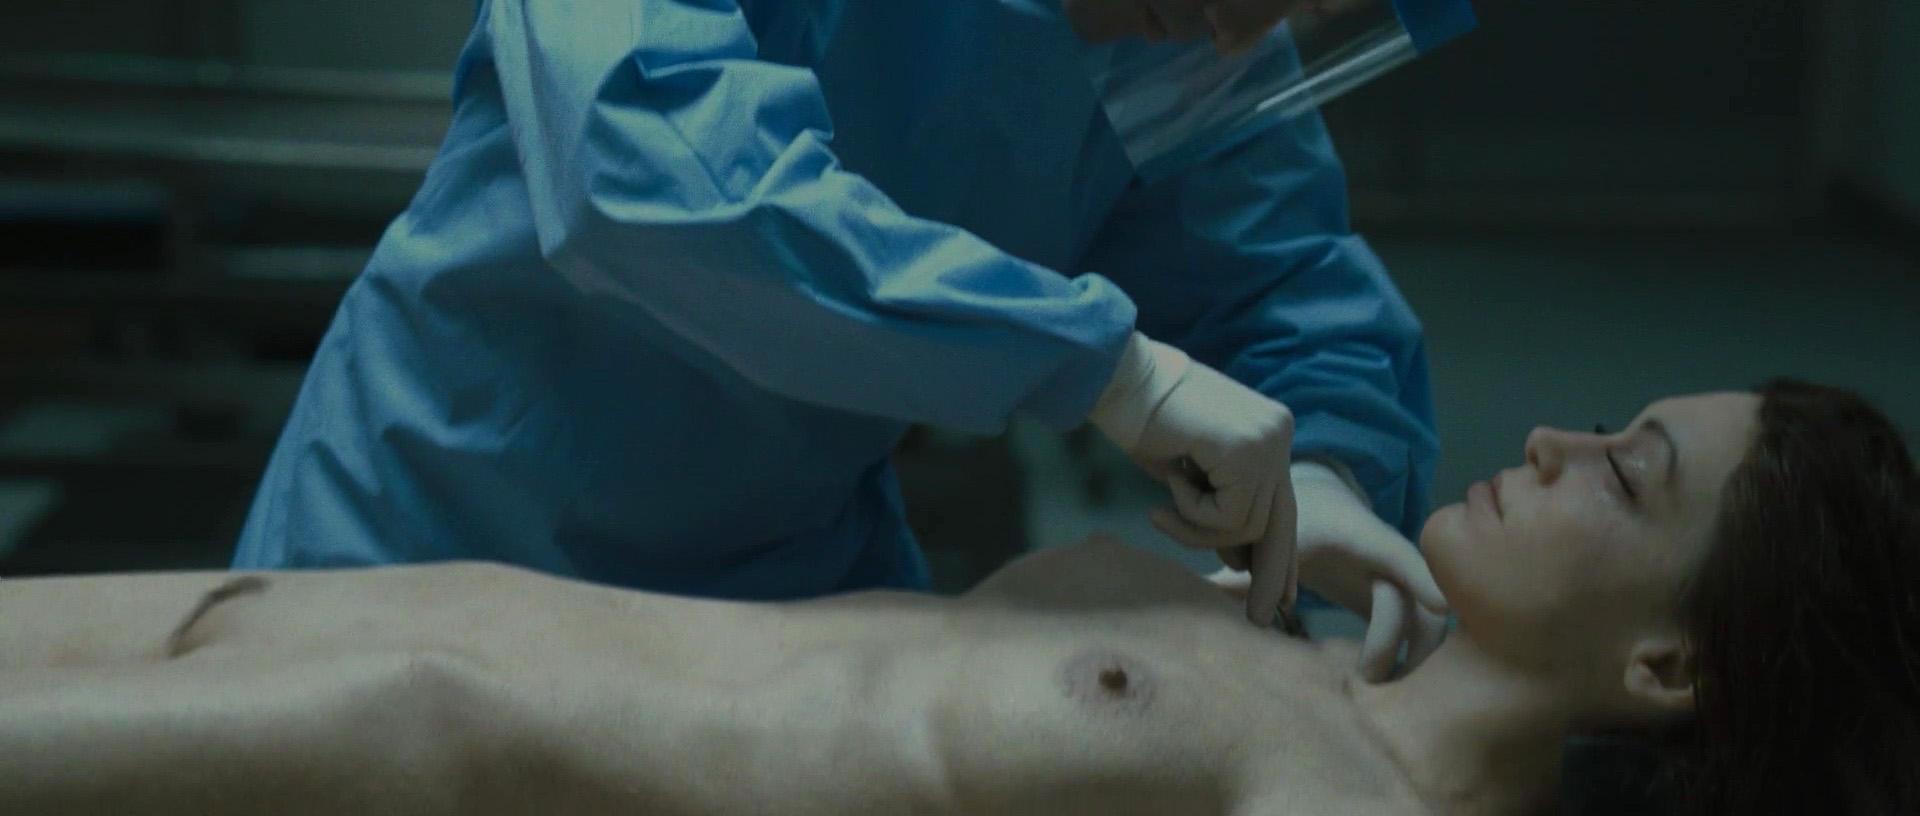 Alyssa Milano Nude Outer Limits watch online - alyssa milano – charmed s03e07-22 (2000)